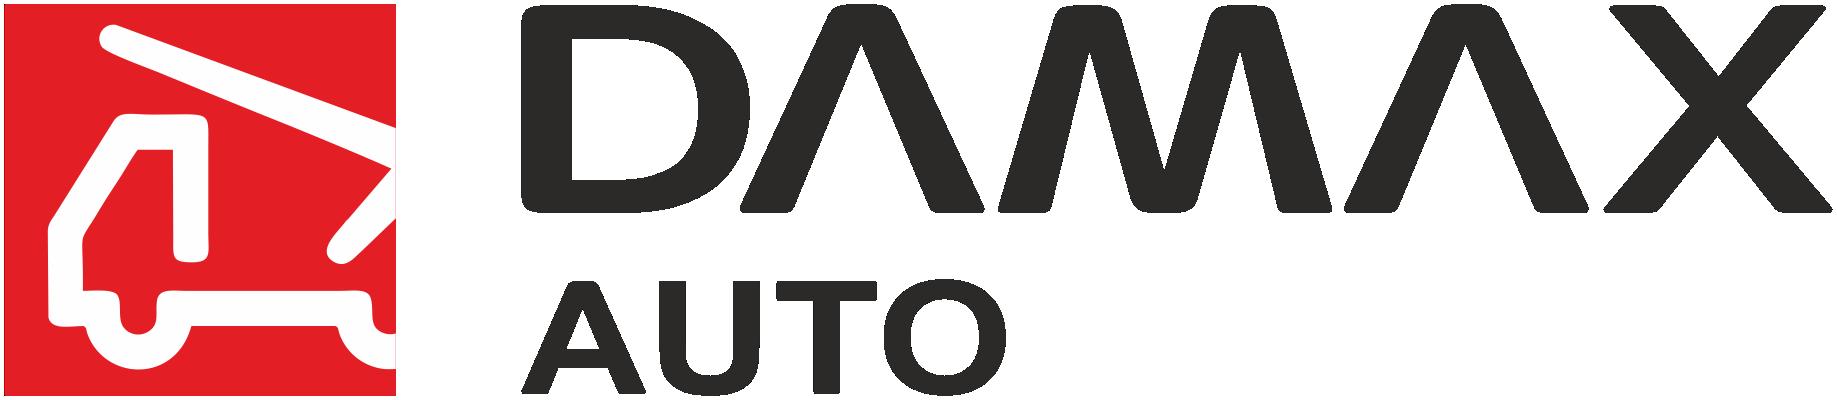 Damax Auto